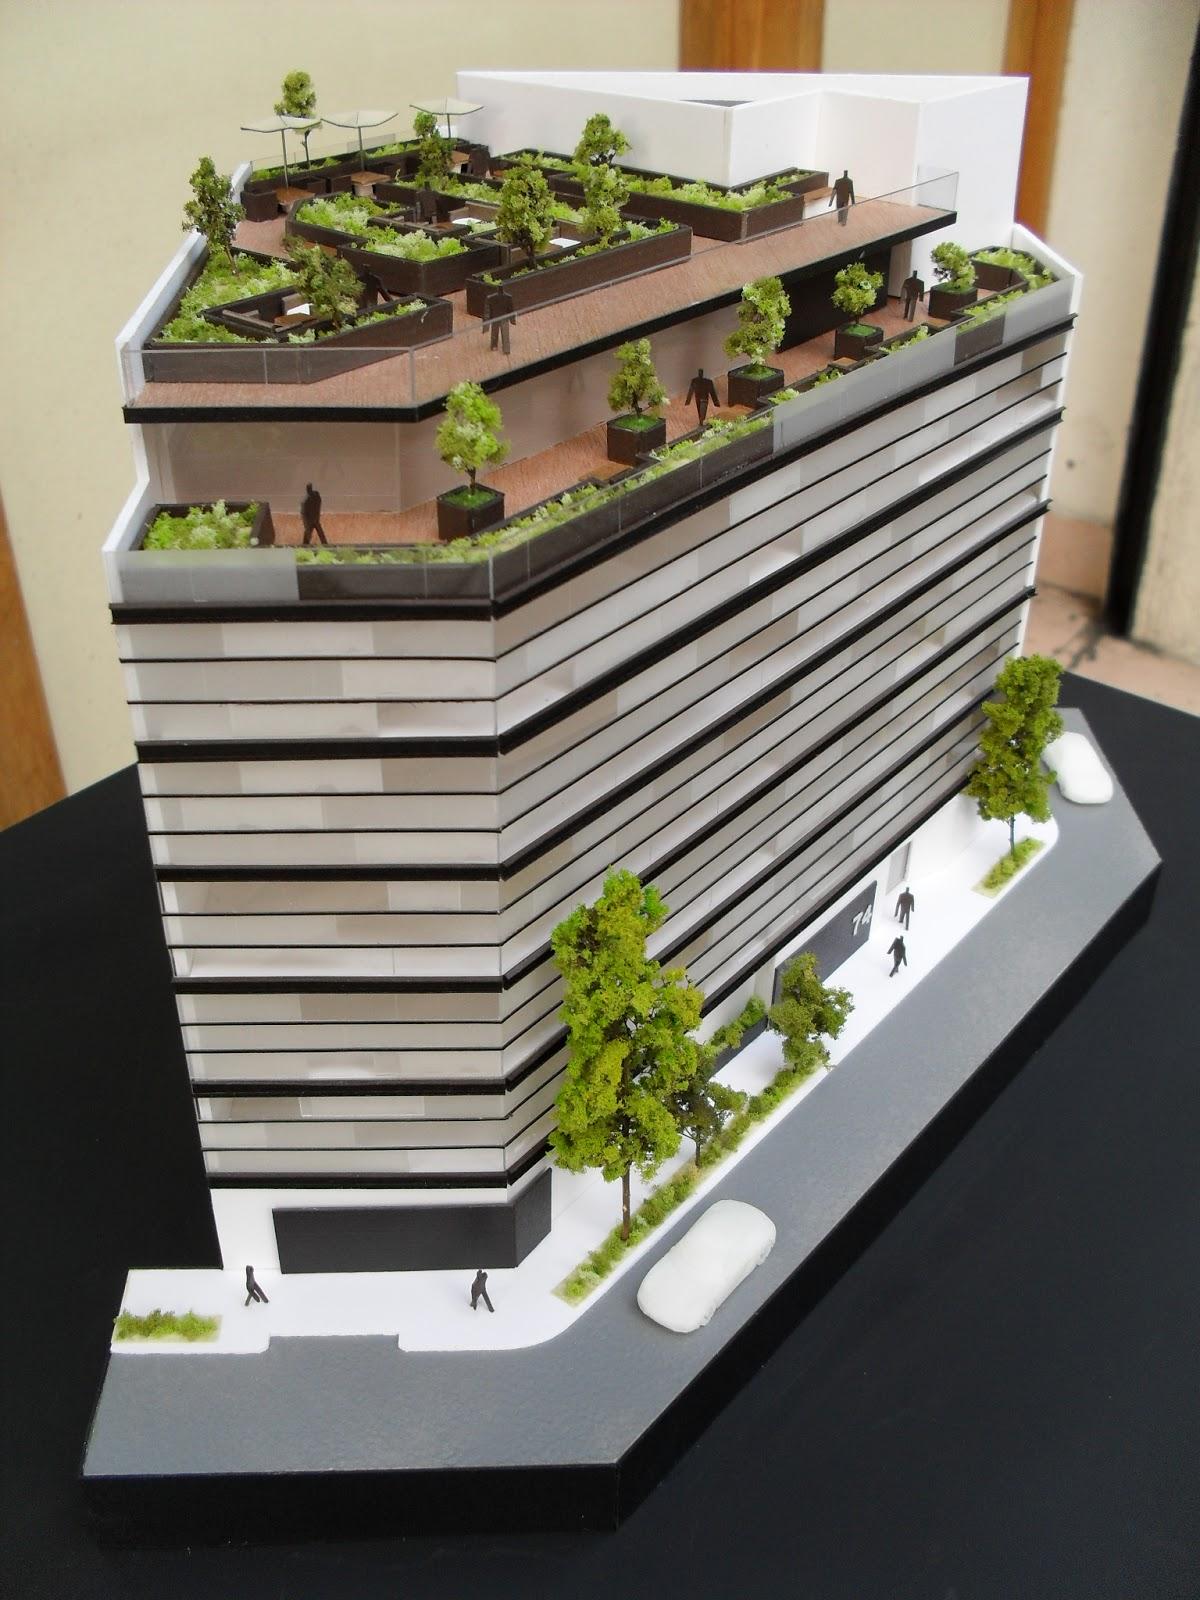 Cr estudio de arquitectura enero 2011 for Estudio de arquitectura en ingles